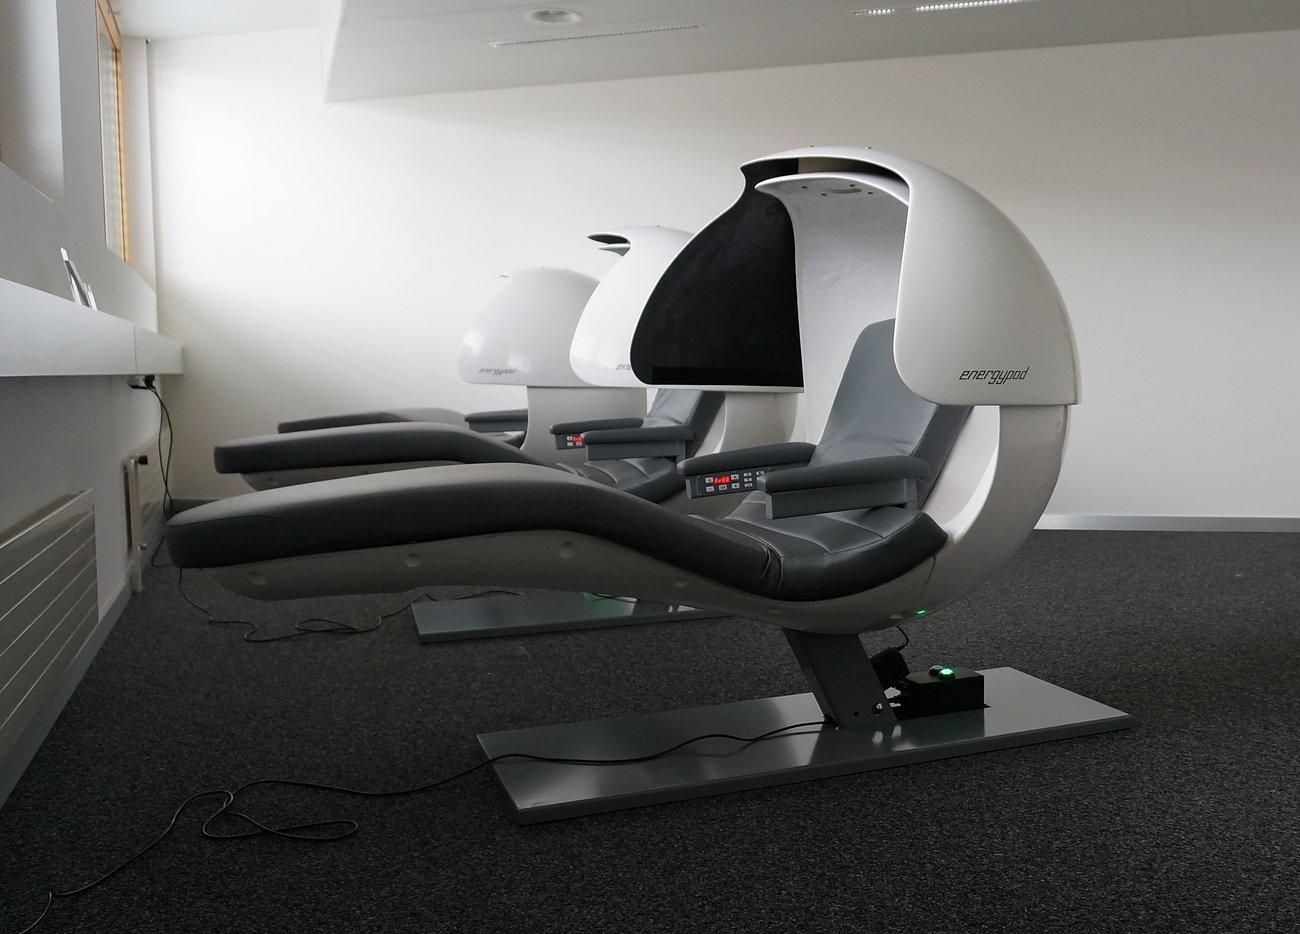 metronaps energypod nap chair (3)